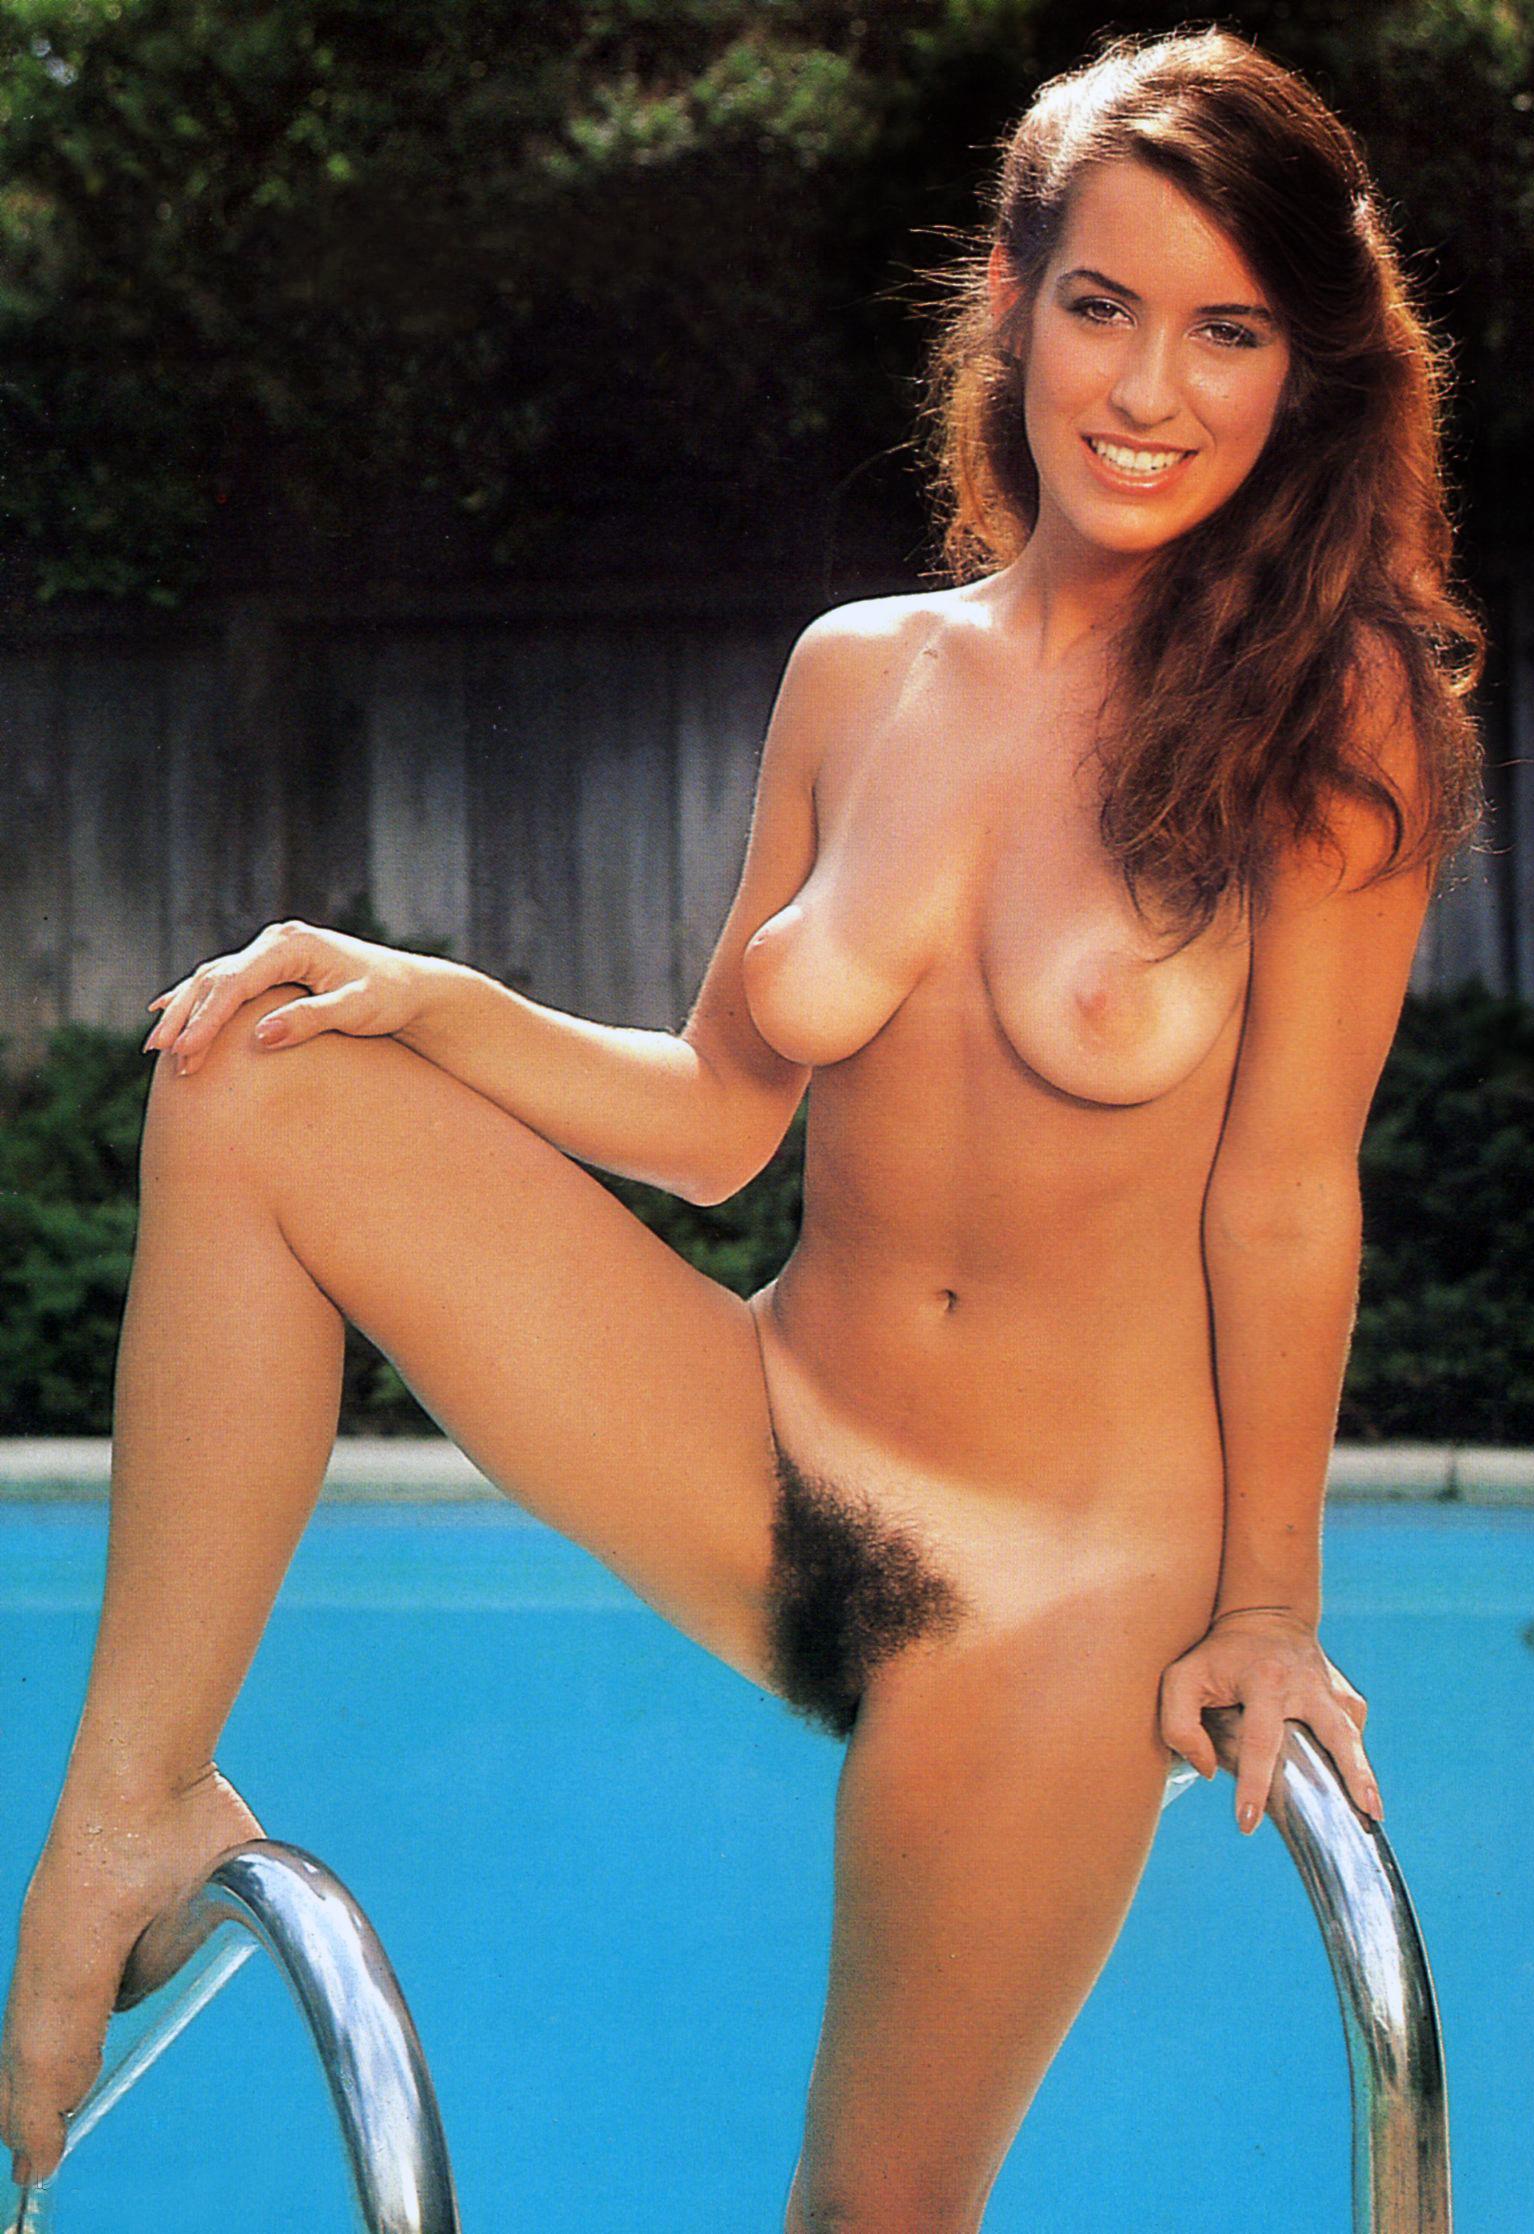 Pornstar Tina Ross aka Lauren Wilde 02.jpg